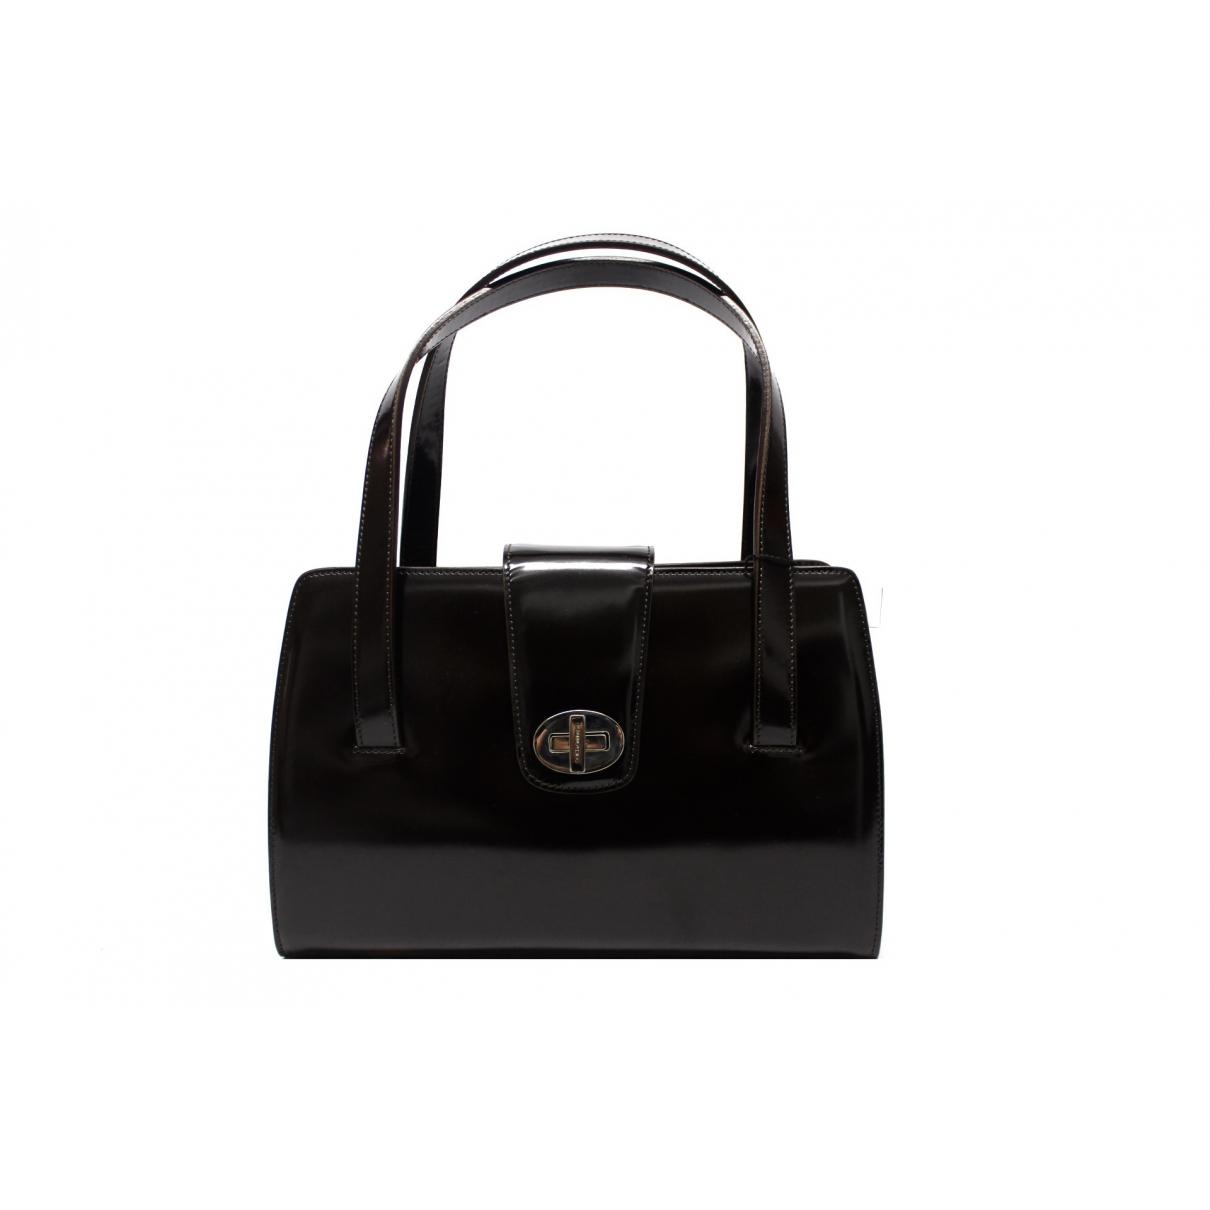 Dolce & Gabbana - Sac a main   pour femme en cuir verni - marron